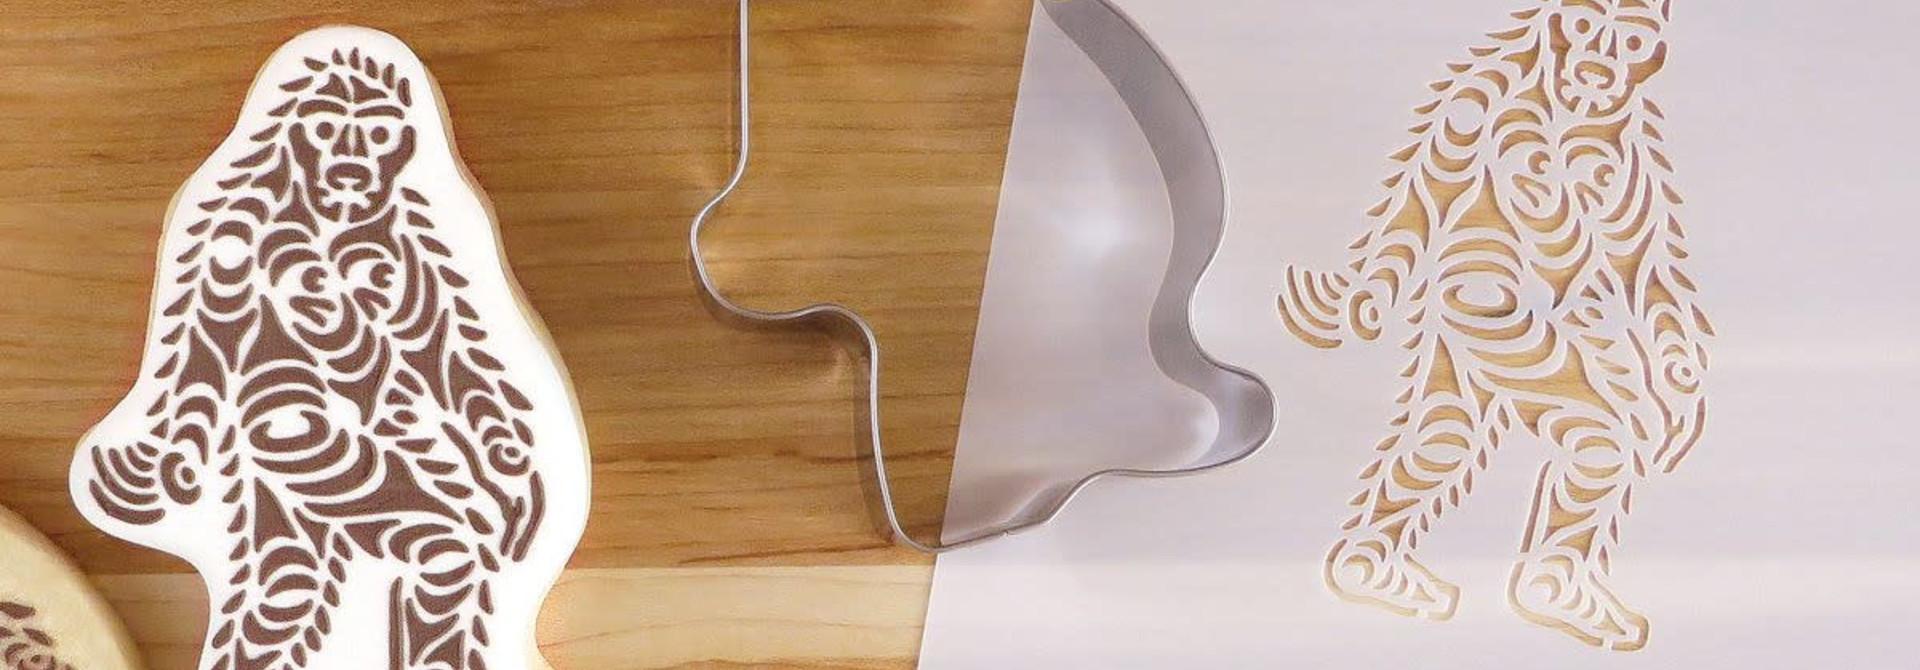 Cookie Cutter & Stencil Set-Sasquatch by Francis Horne Sr.